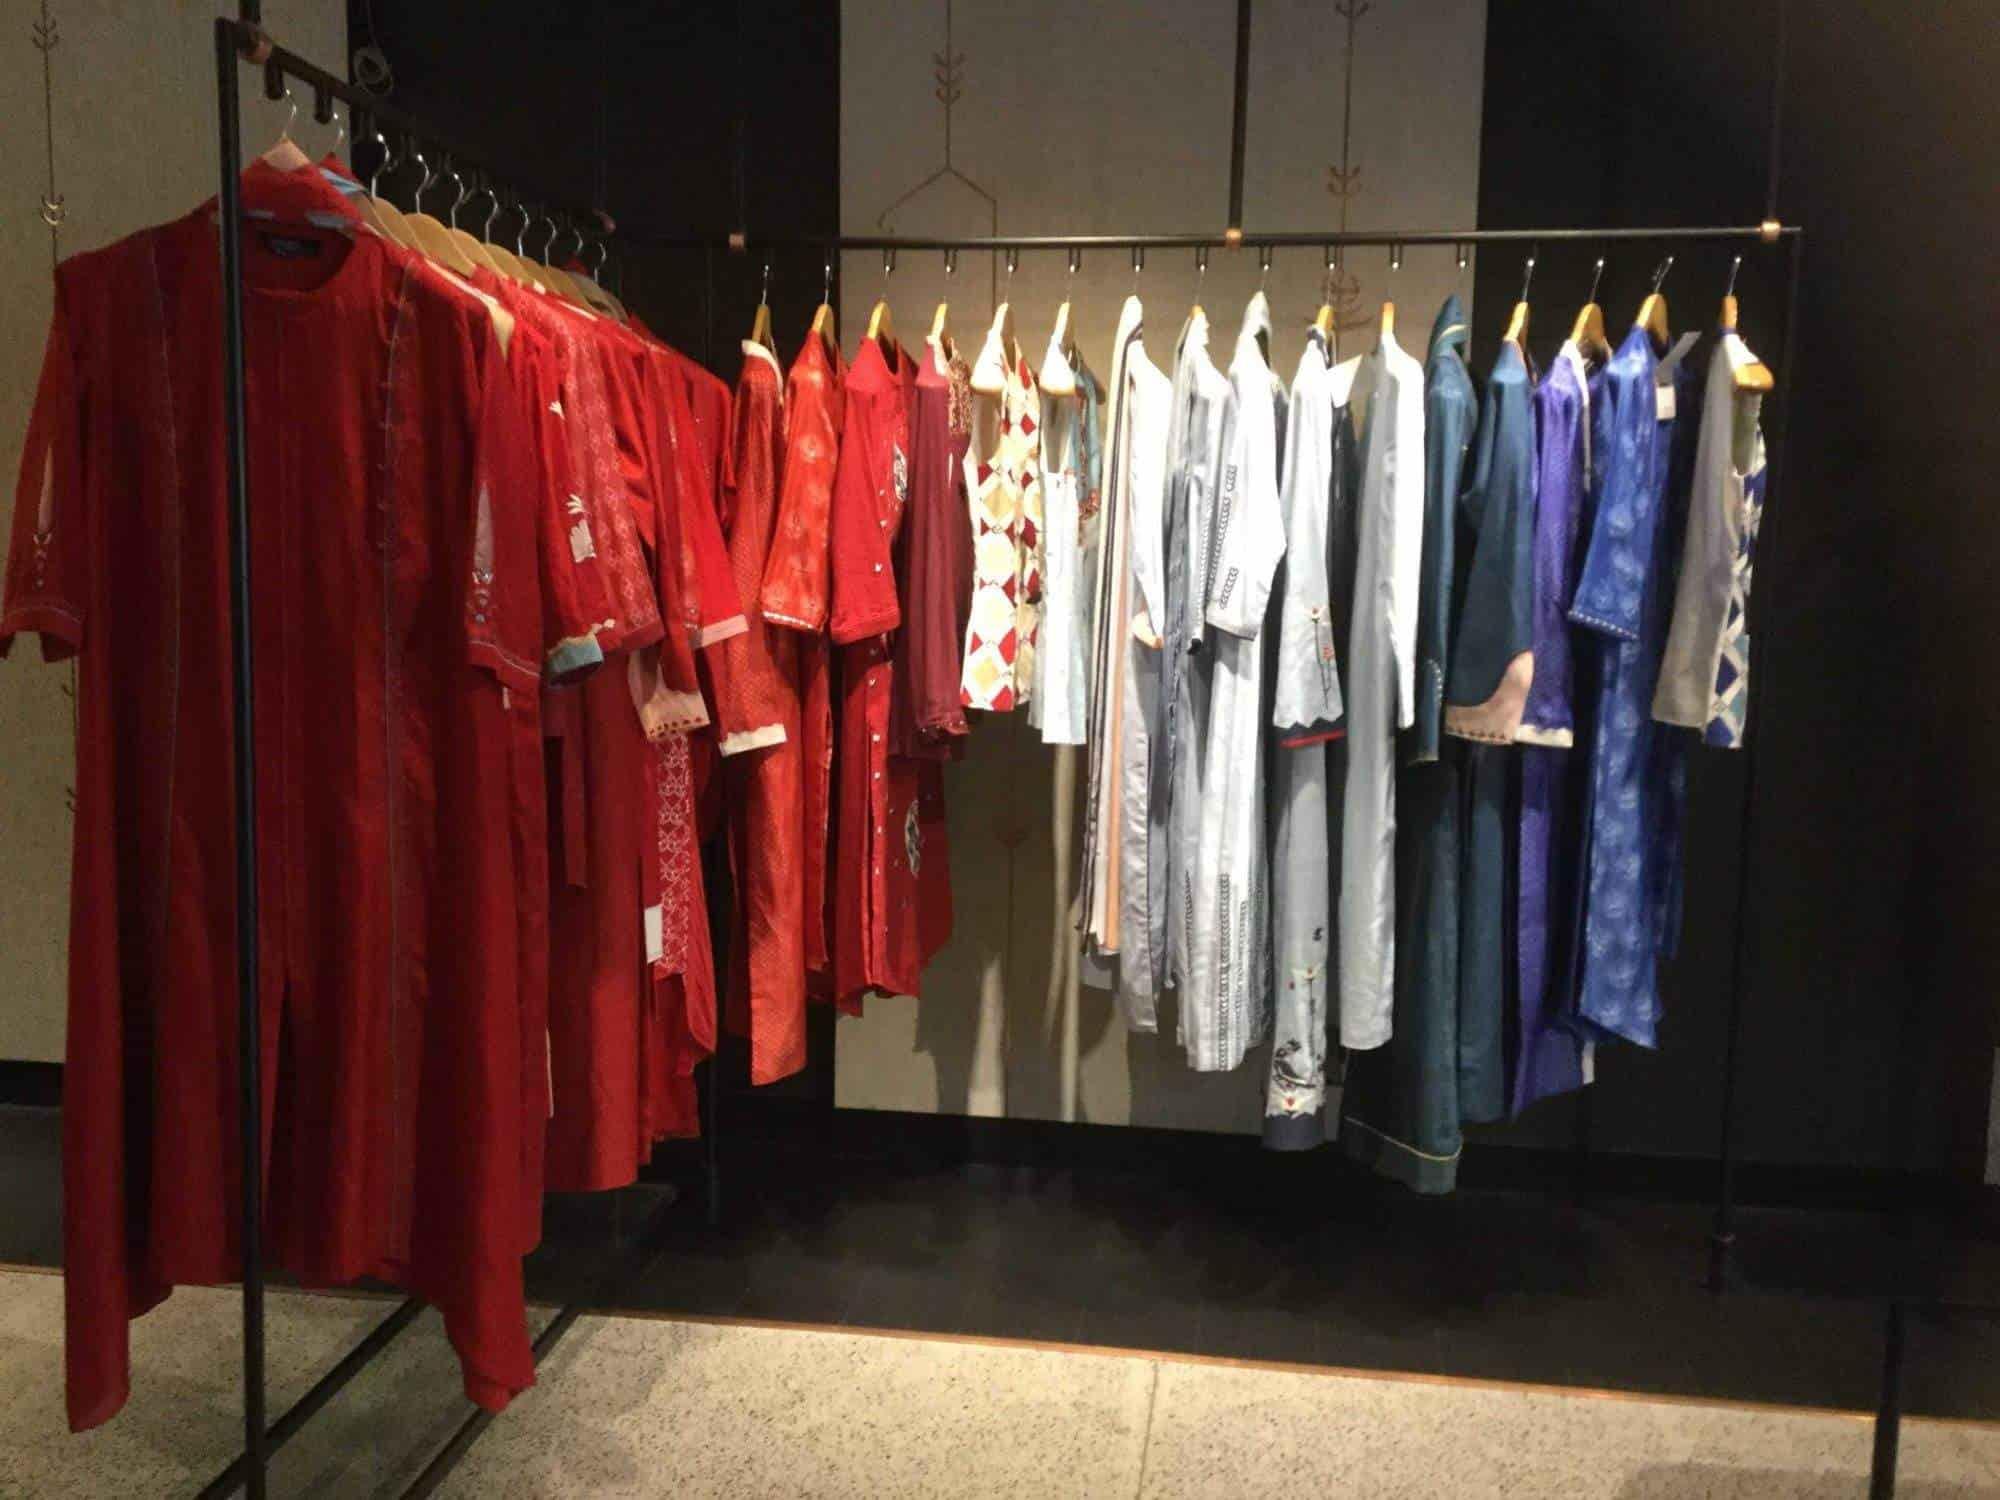 Stupendous Am Pm Banjara Hills Readymade Garment Retailers In Download Free Architecture Designs Scobabritishbridgeorg